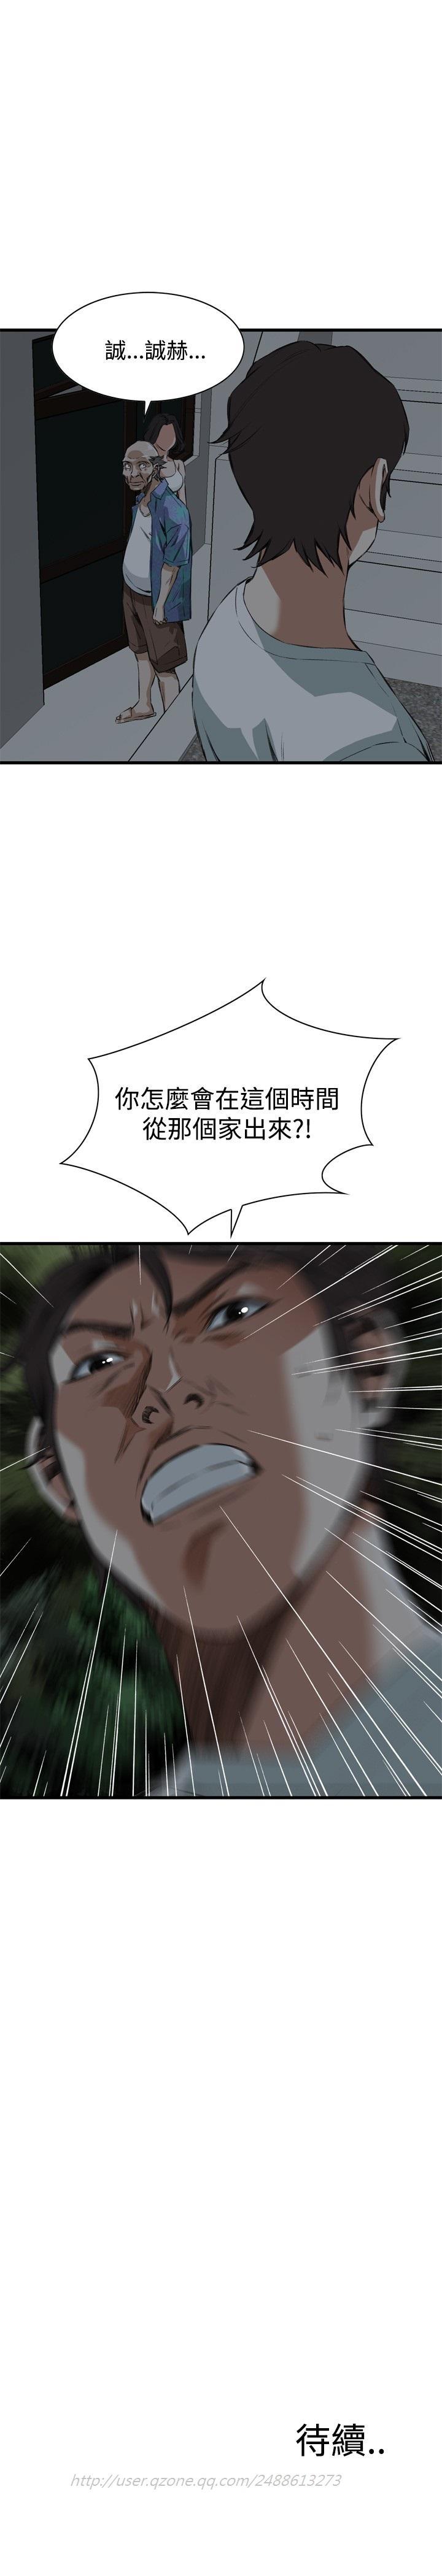 Take a Peek 偷窥 Ch.39~55 [Chinese]中文 205